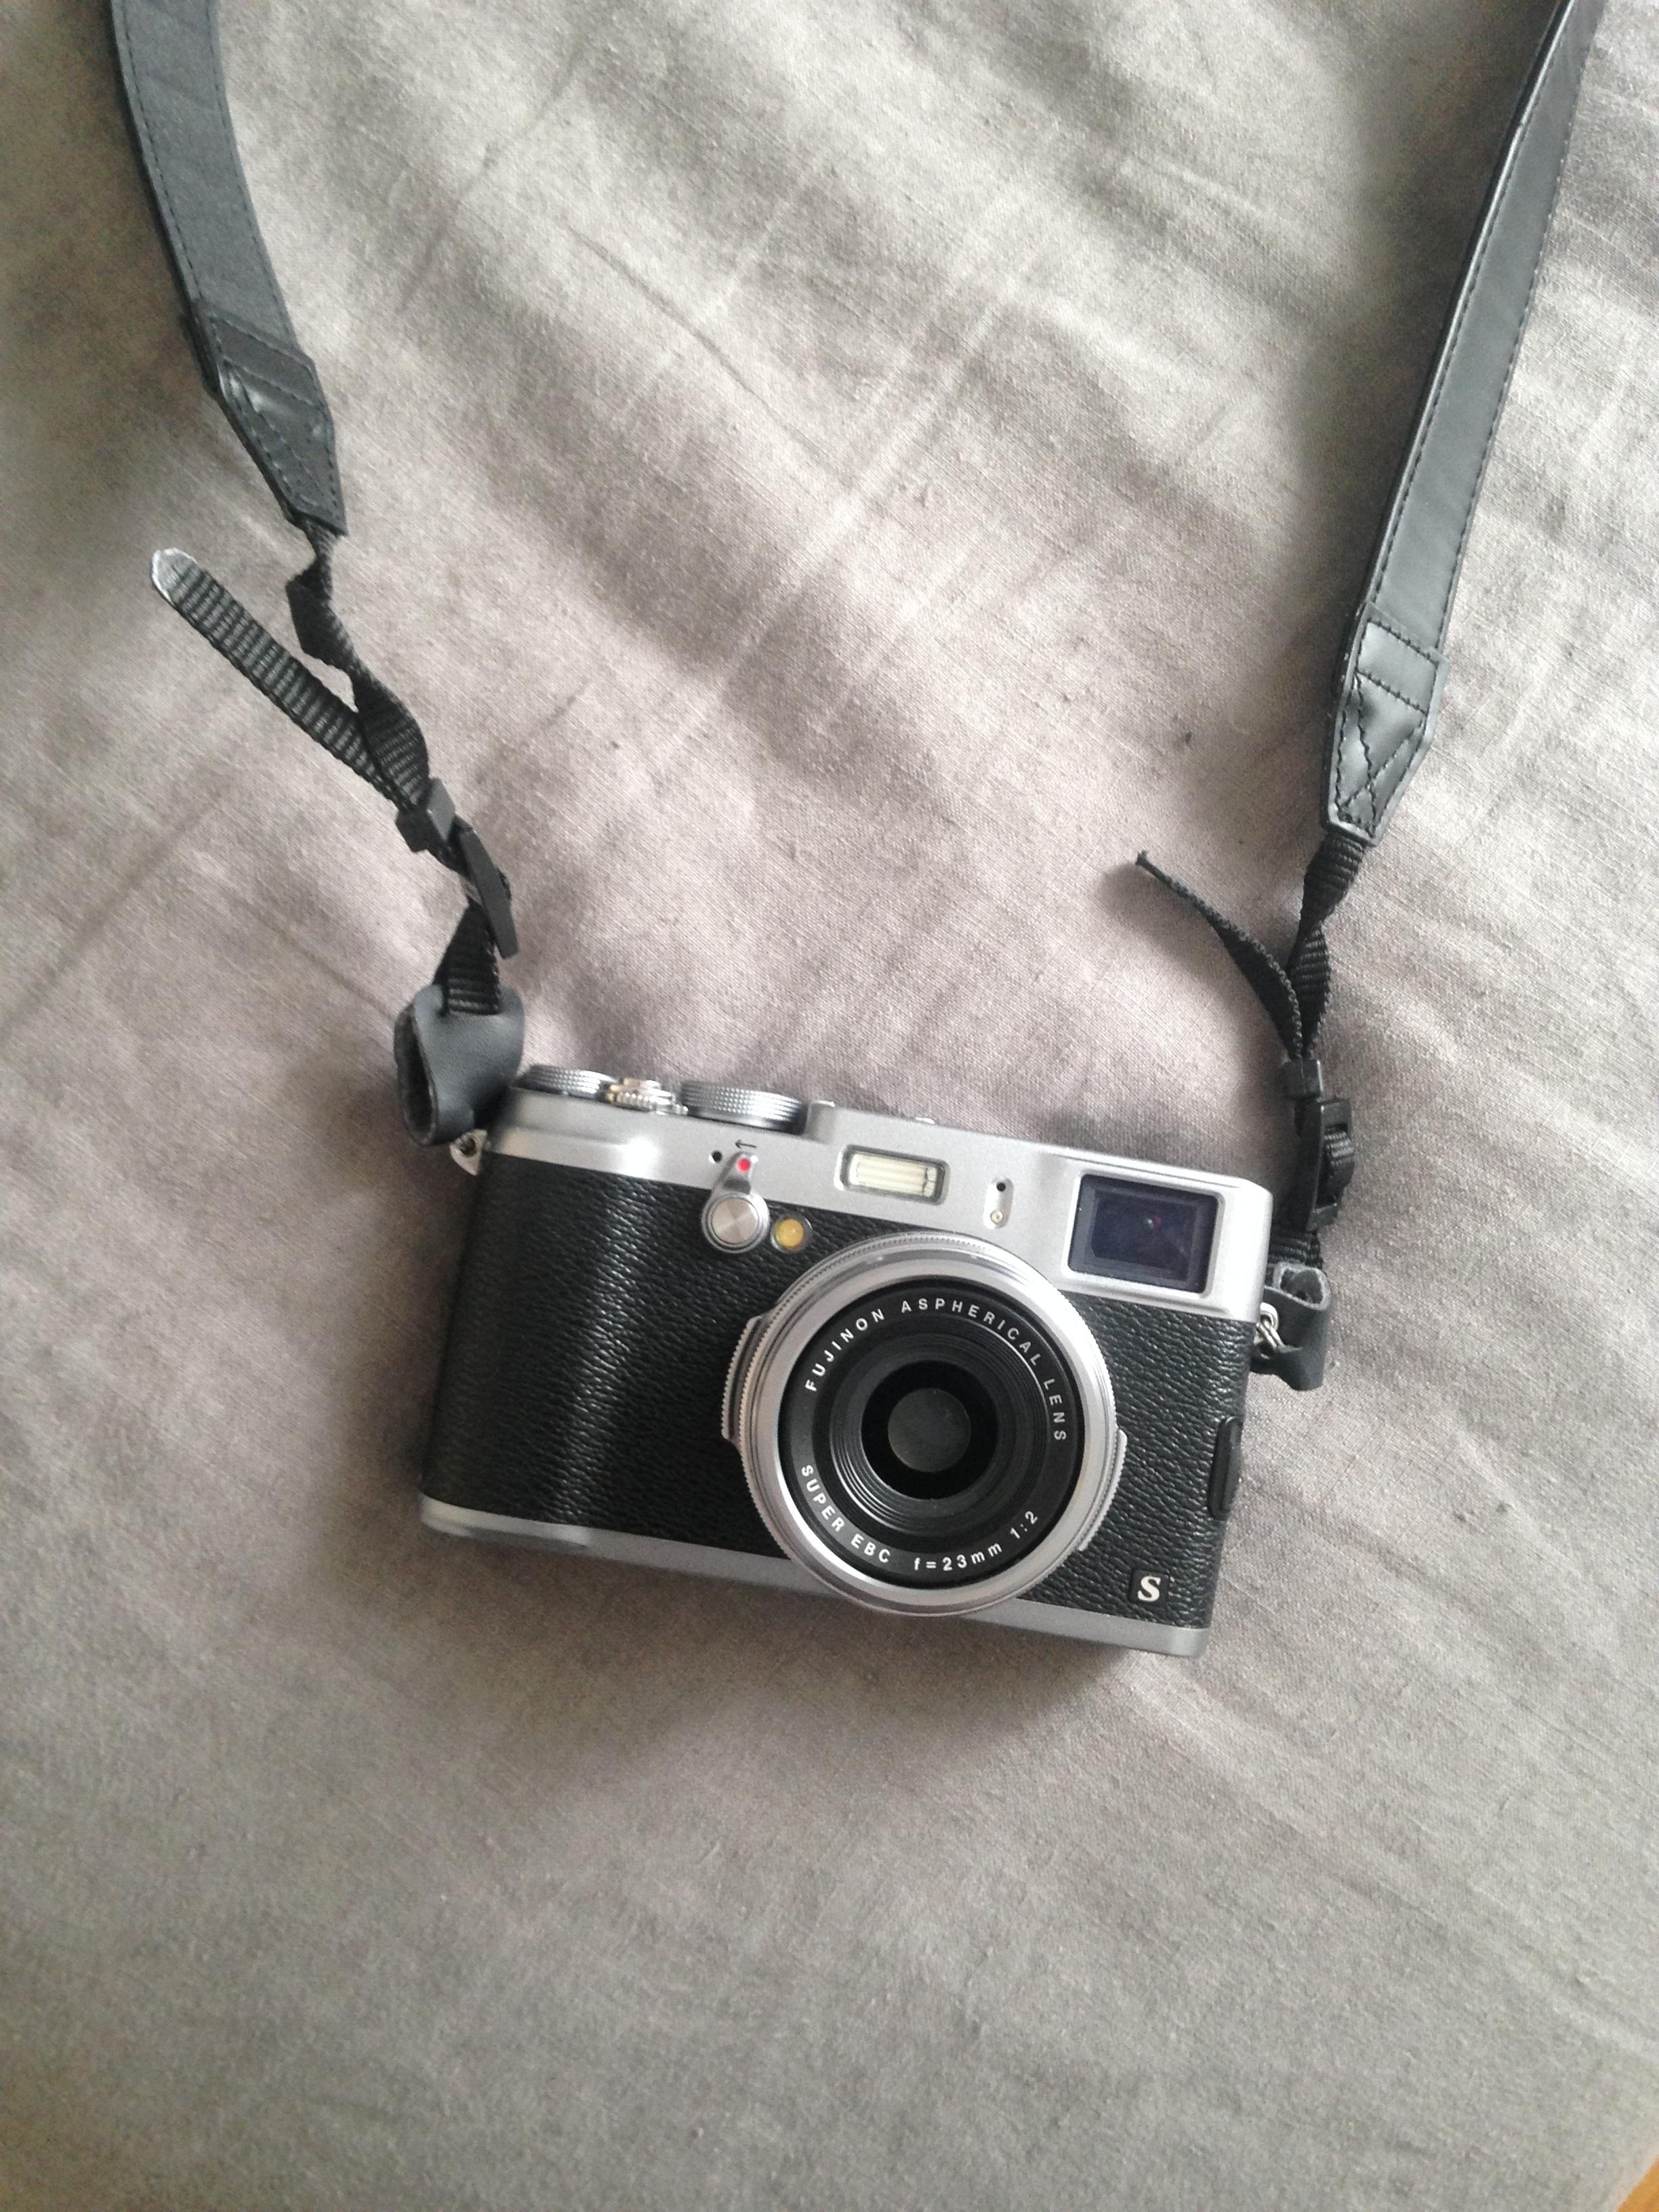 My fujifilm travel camera